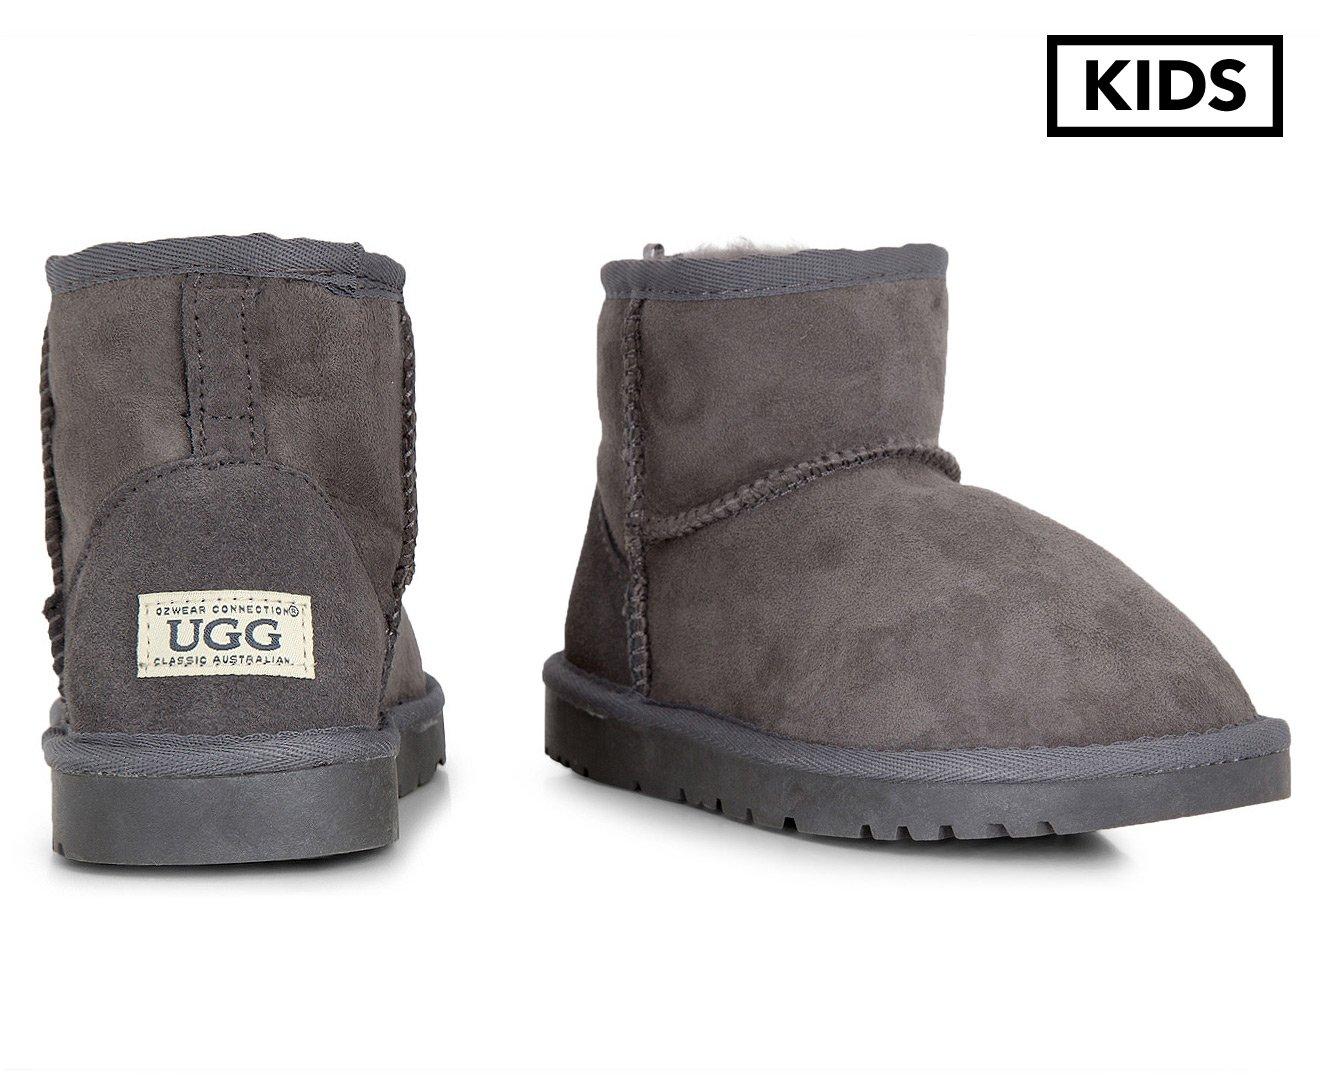 193011a2779 Ozwear Connection Kids  Mini UGG Boots Charcoal  Amazon.com.au  Fashion